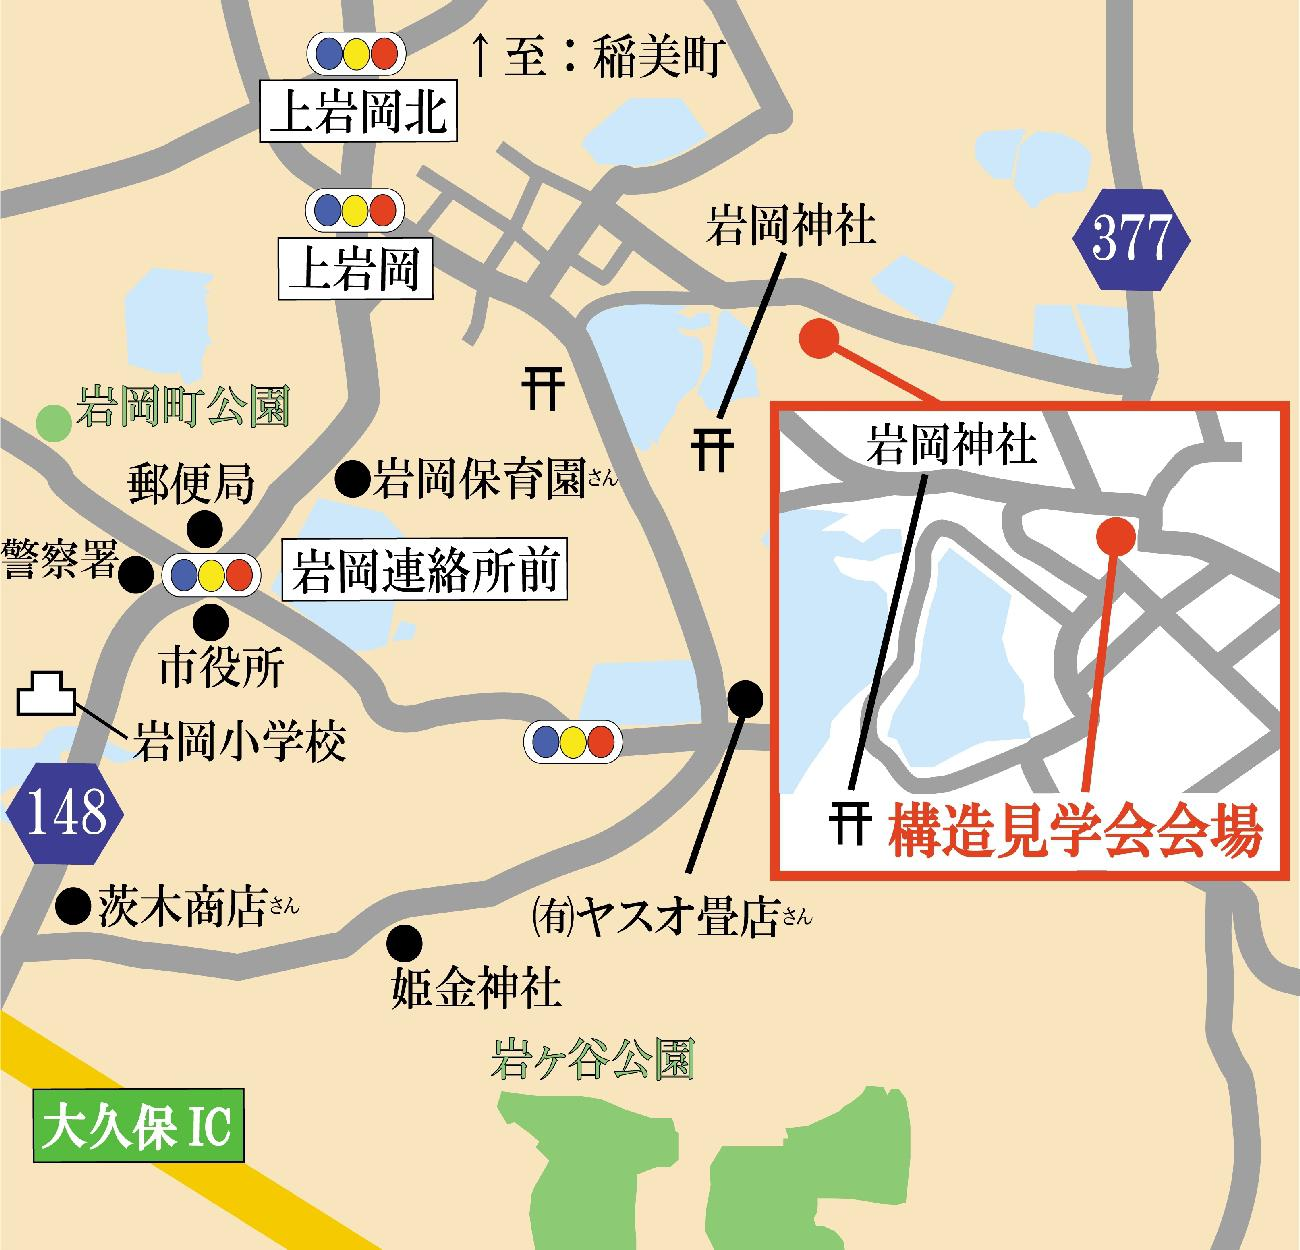 image-0001-3.jpg